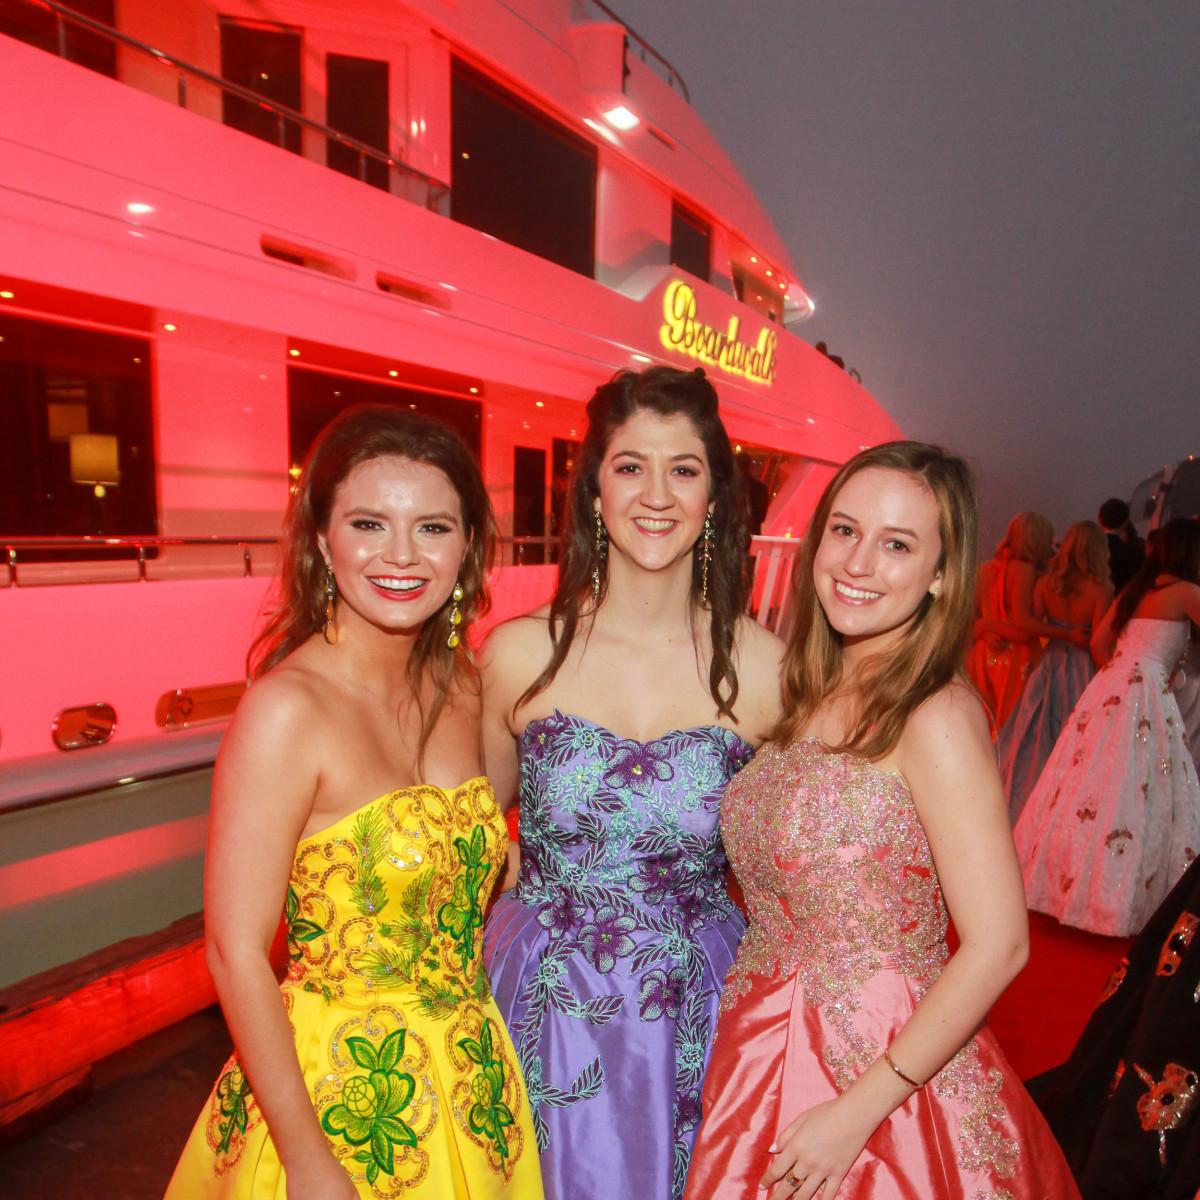 Mardi Gras San Luis 2019 Usher Duchesses Danielle Perugini, Kathryn Criaco, Kaki Duenner